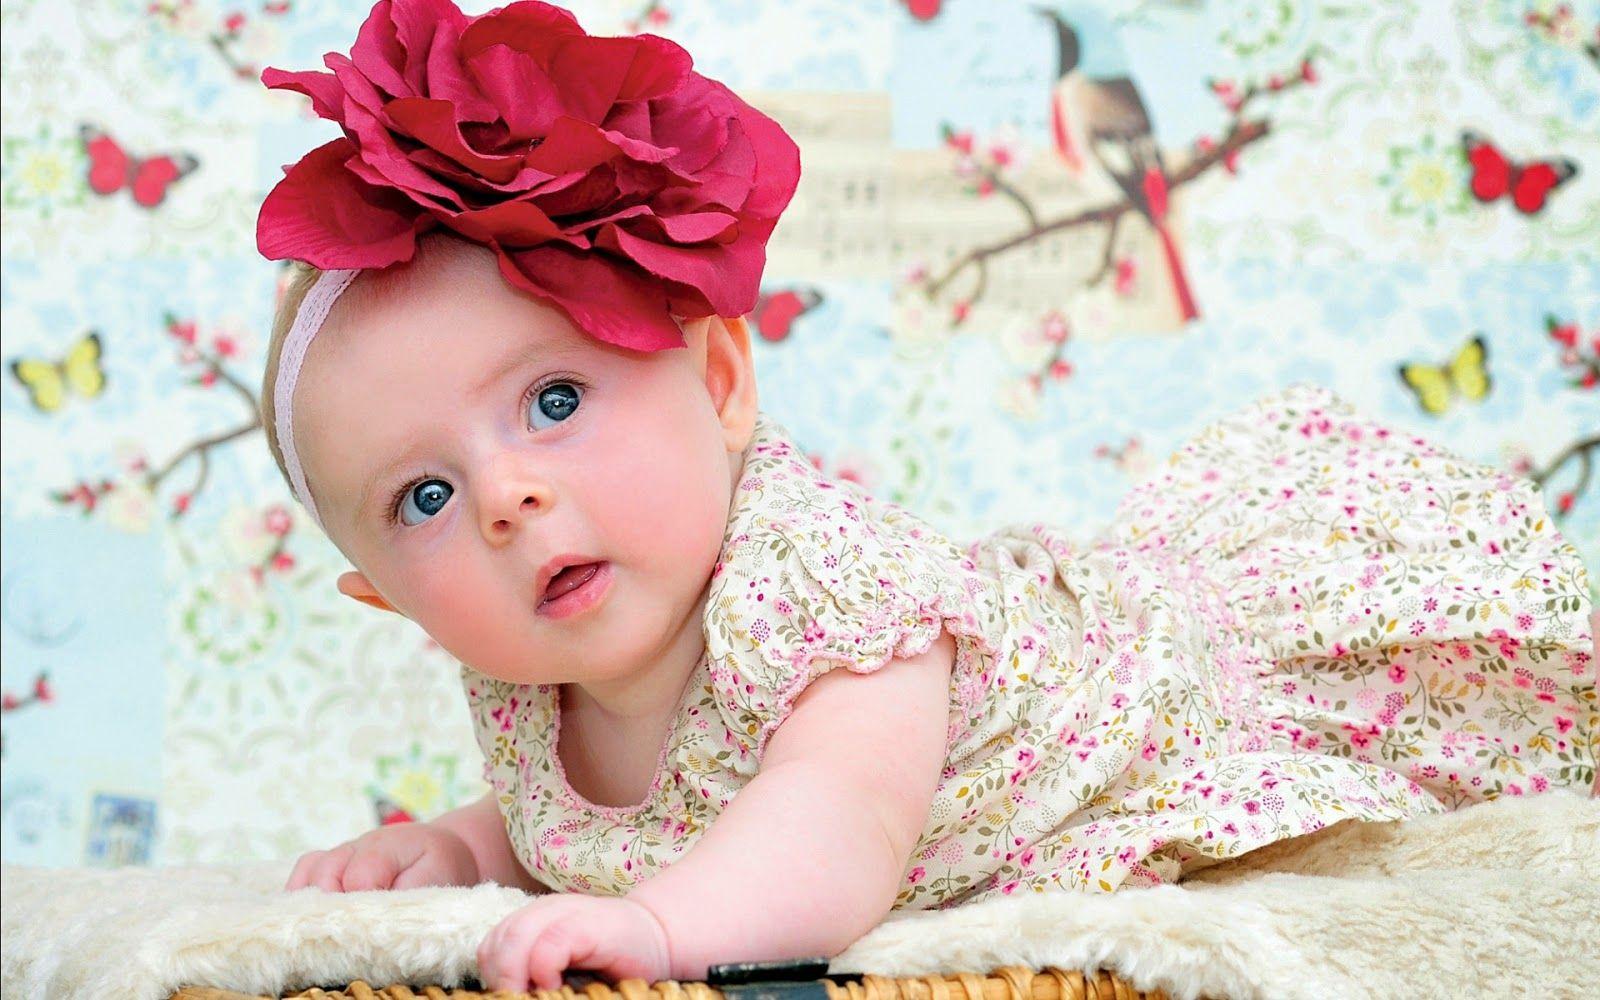 blue eyes baby desktop wallpapers | hd wallpapers | pinterest | baby